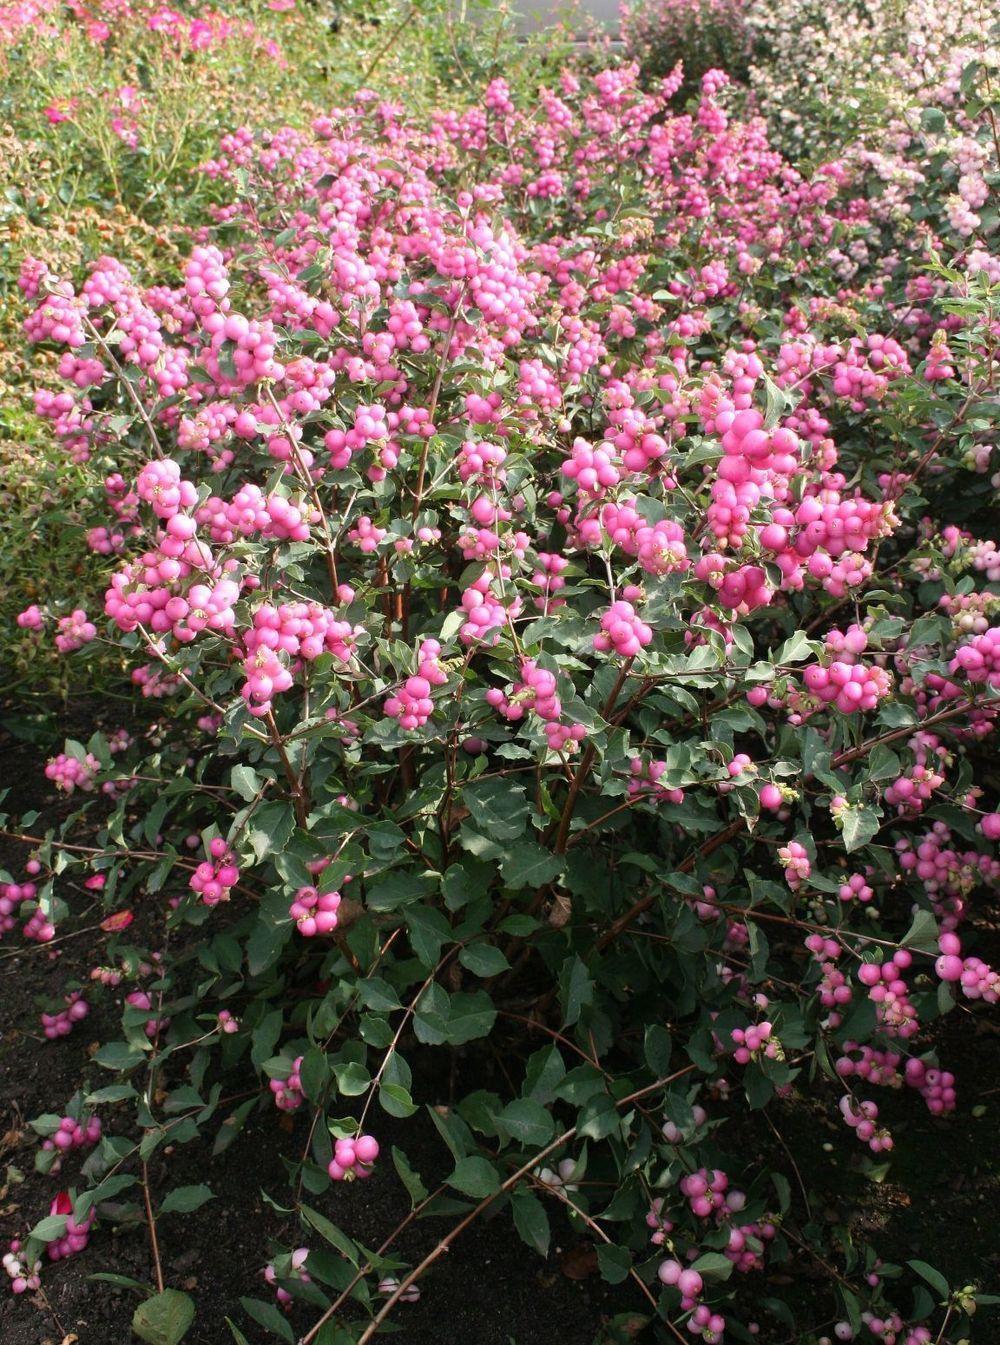 dcf202f975241f625808376ba9e4a3c2 - Winter Flowering Shrubs For Small Gardens